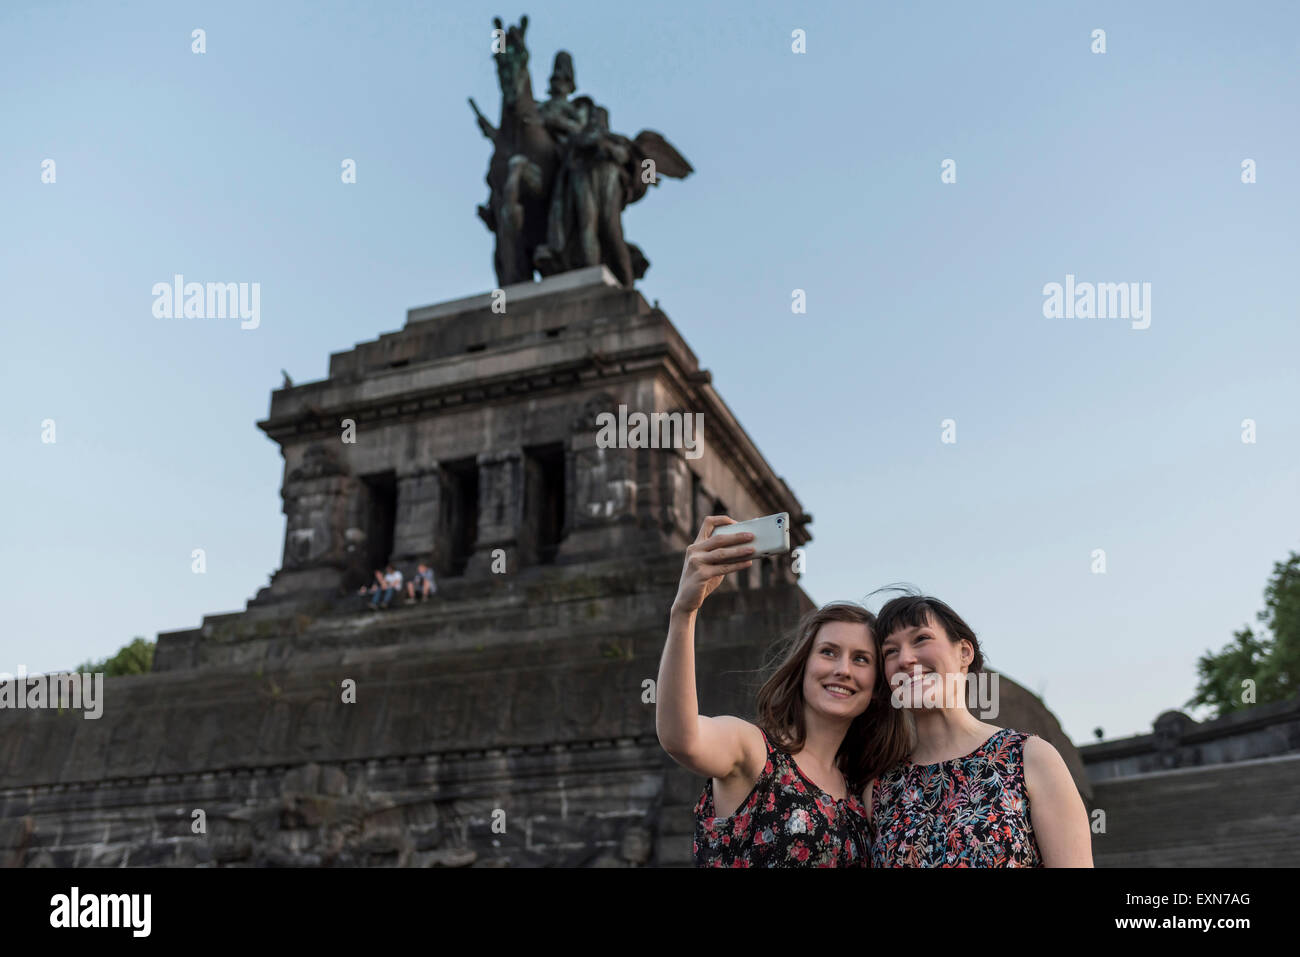 Germany, Koblenz, Deutsches Eck, tourists taking selfie at Emperor-Wilhelm monument - Stock Image